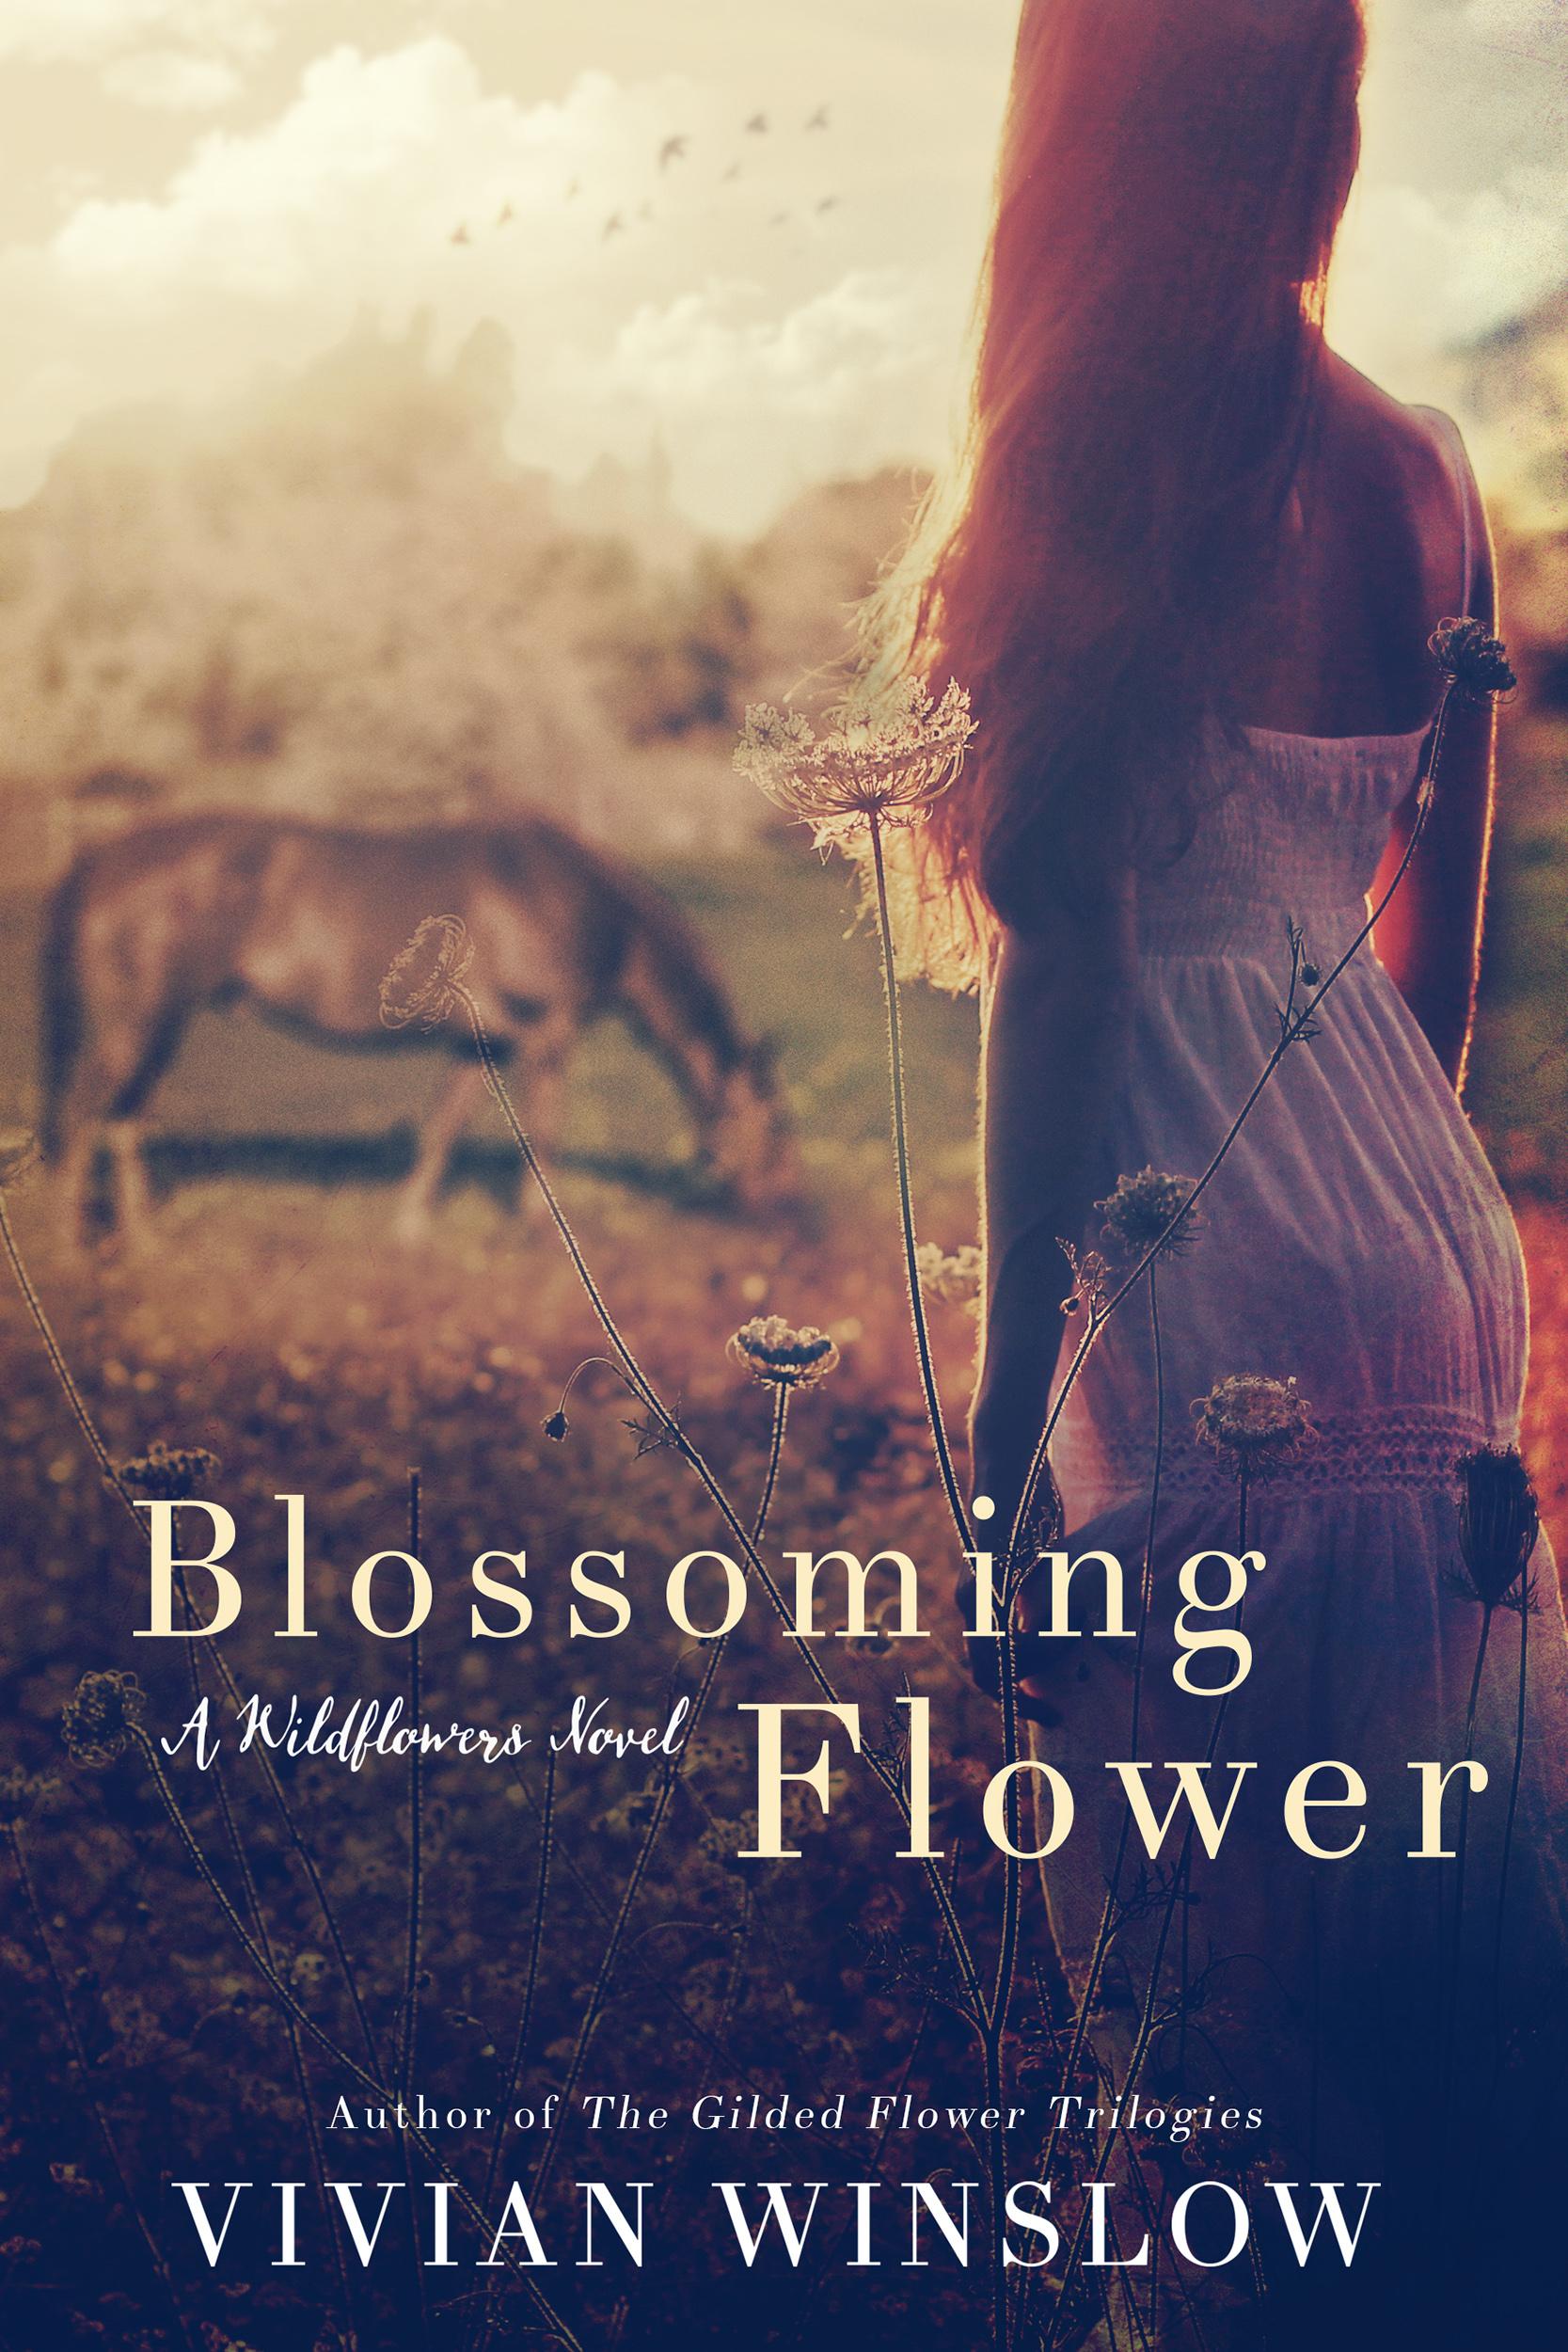 Blossoming Flower